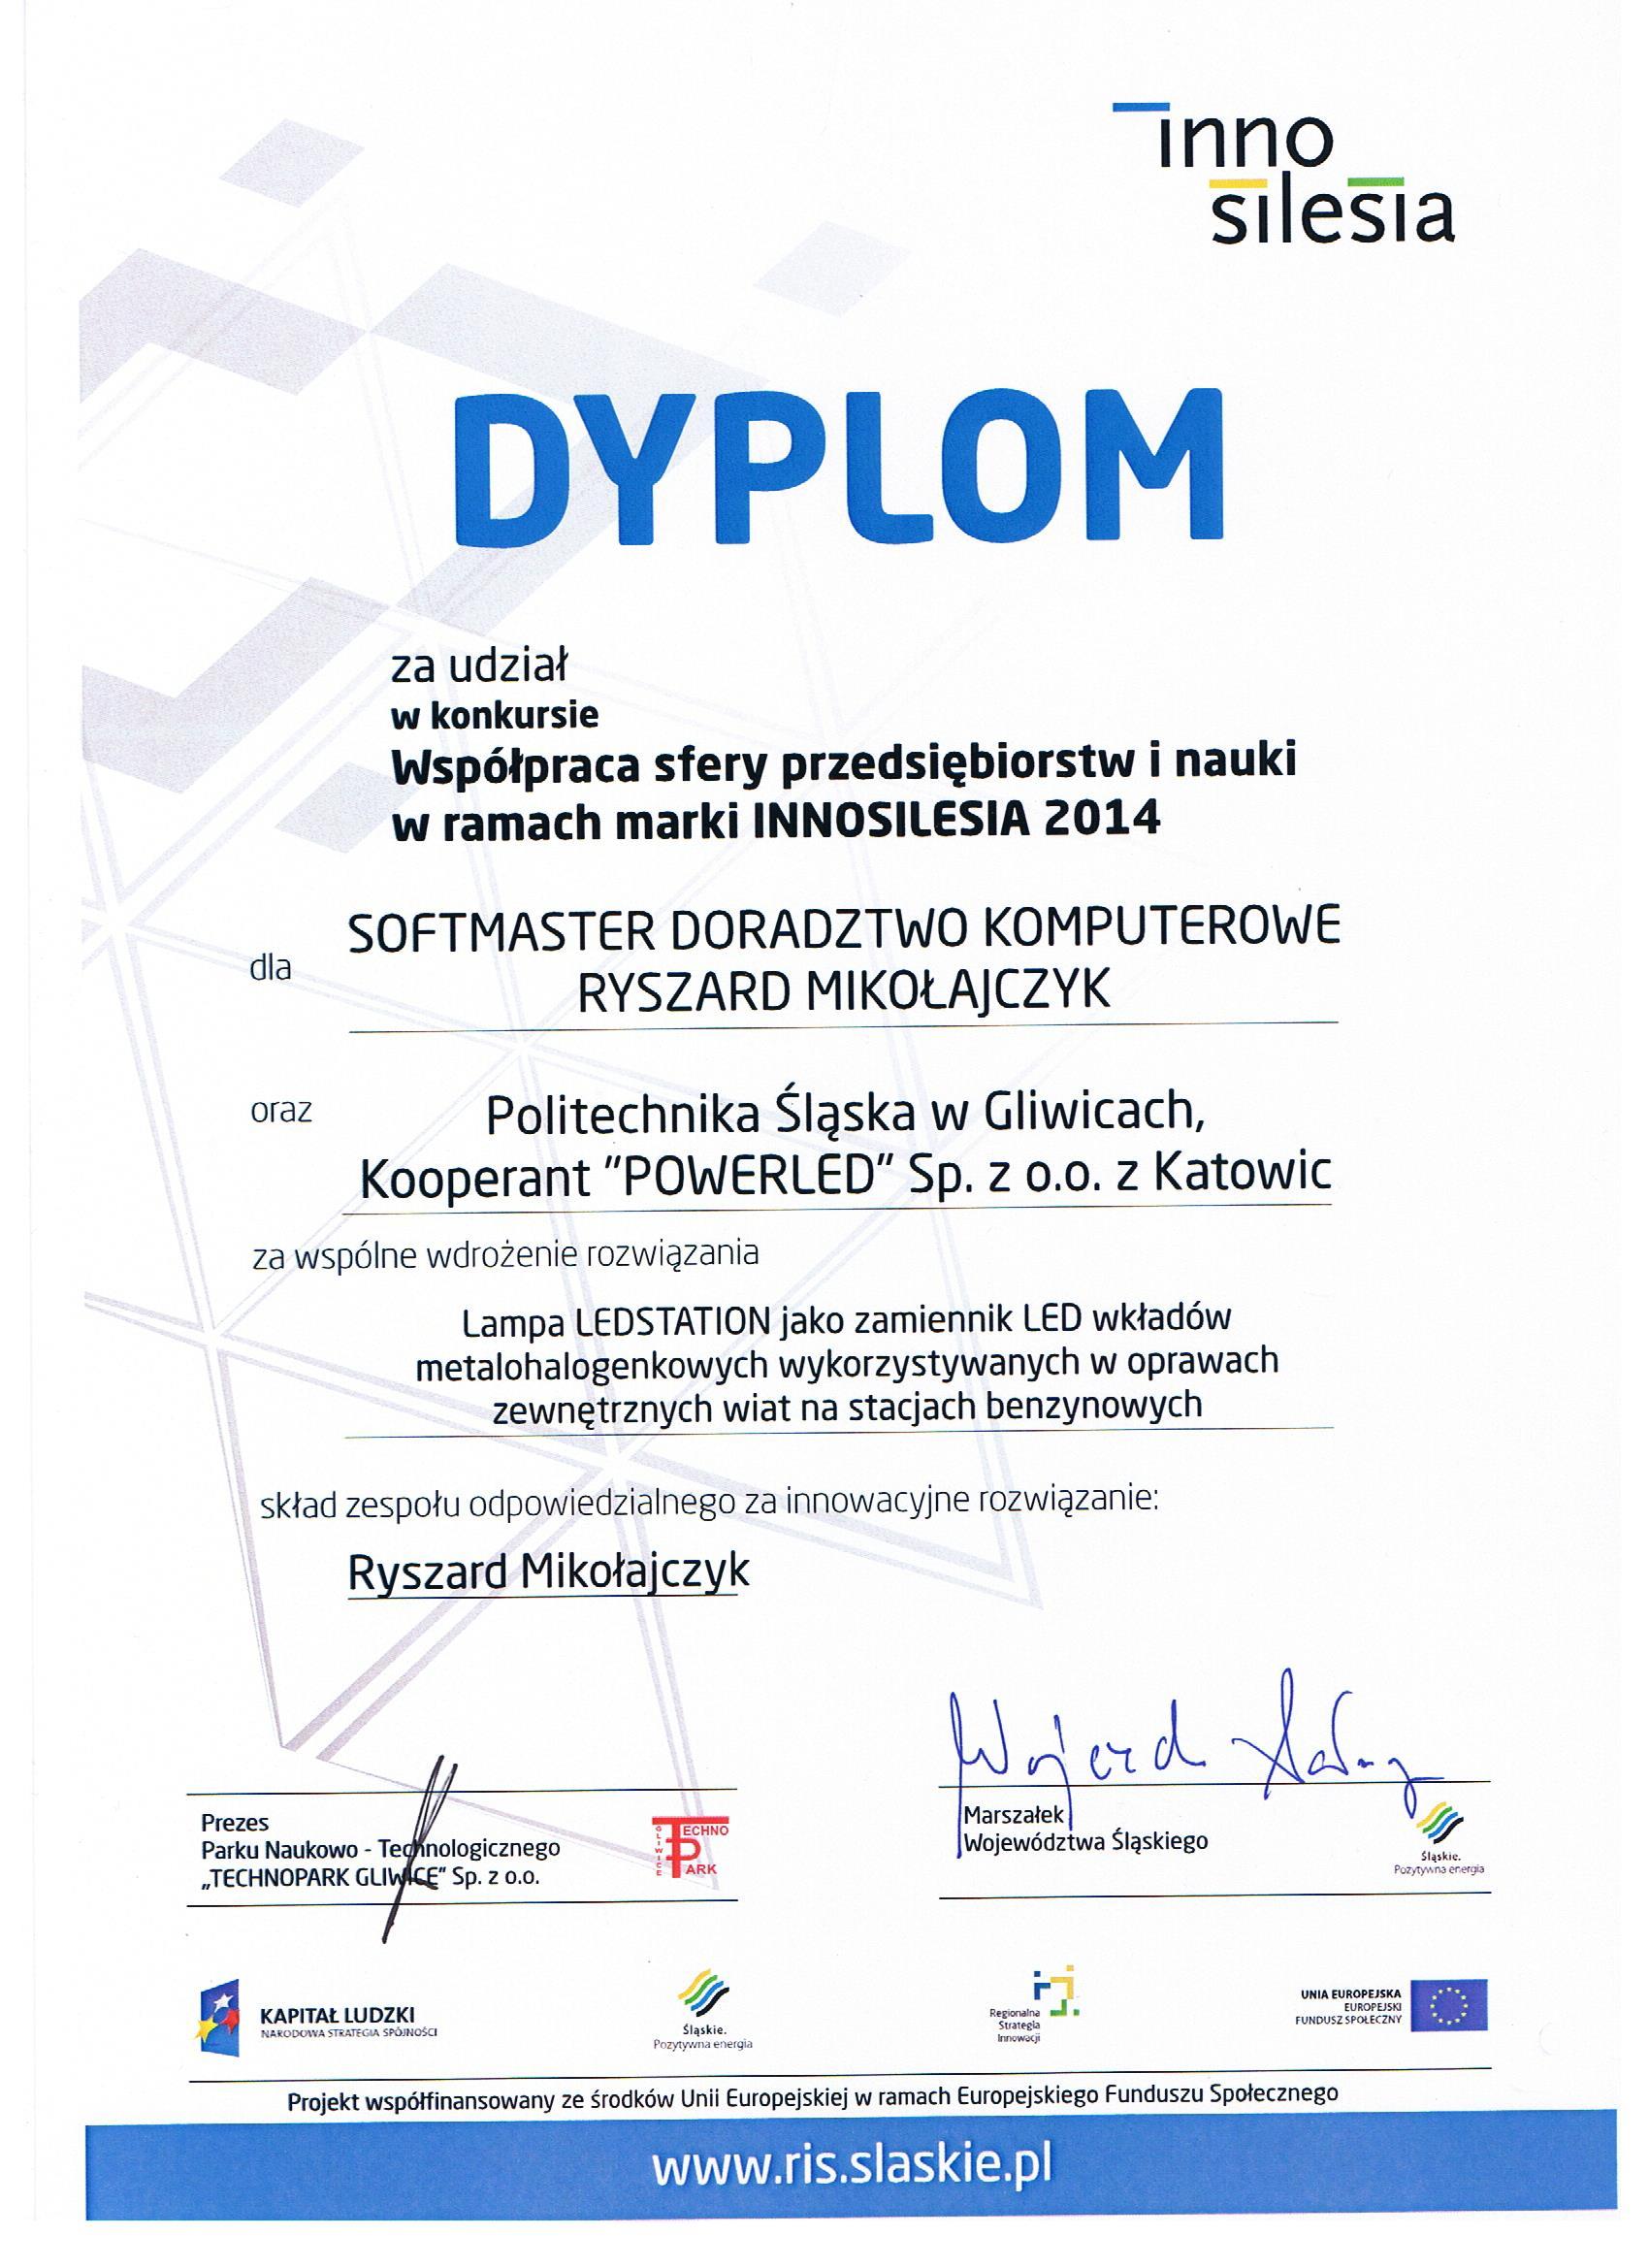 Innosilesia2014-Dyplom ledstation dla SoftMaster